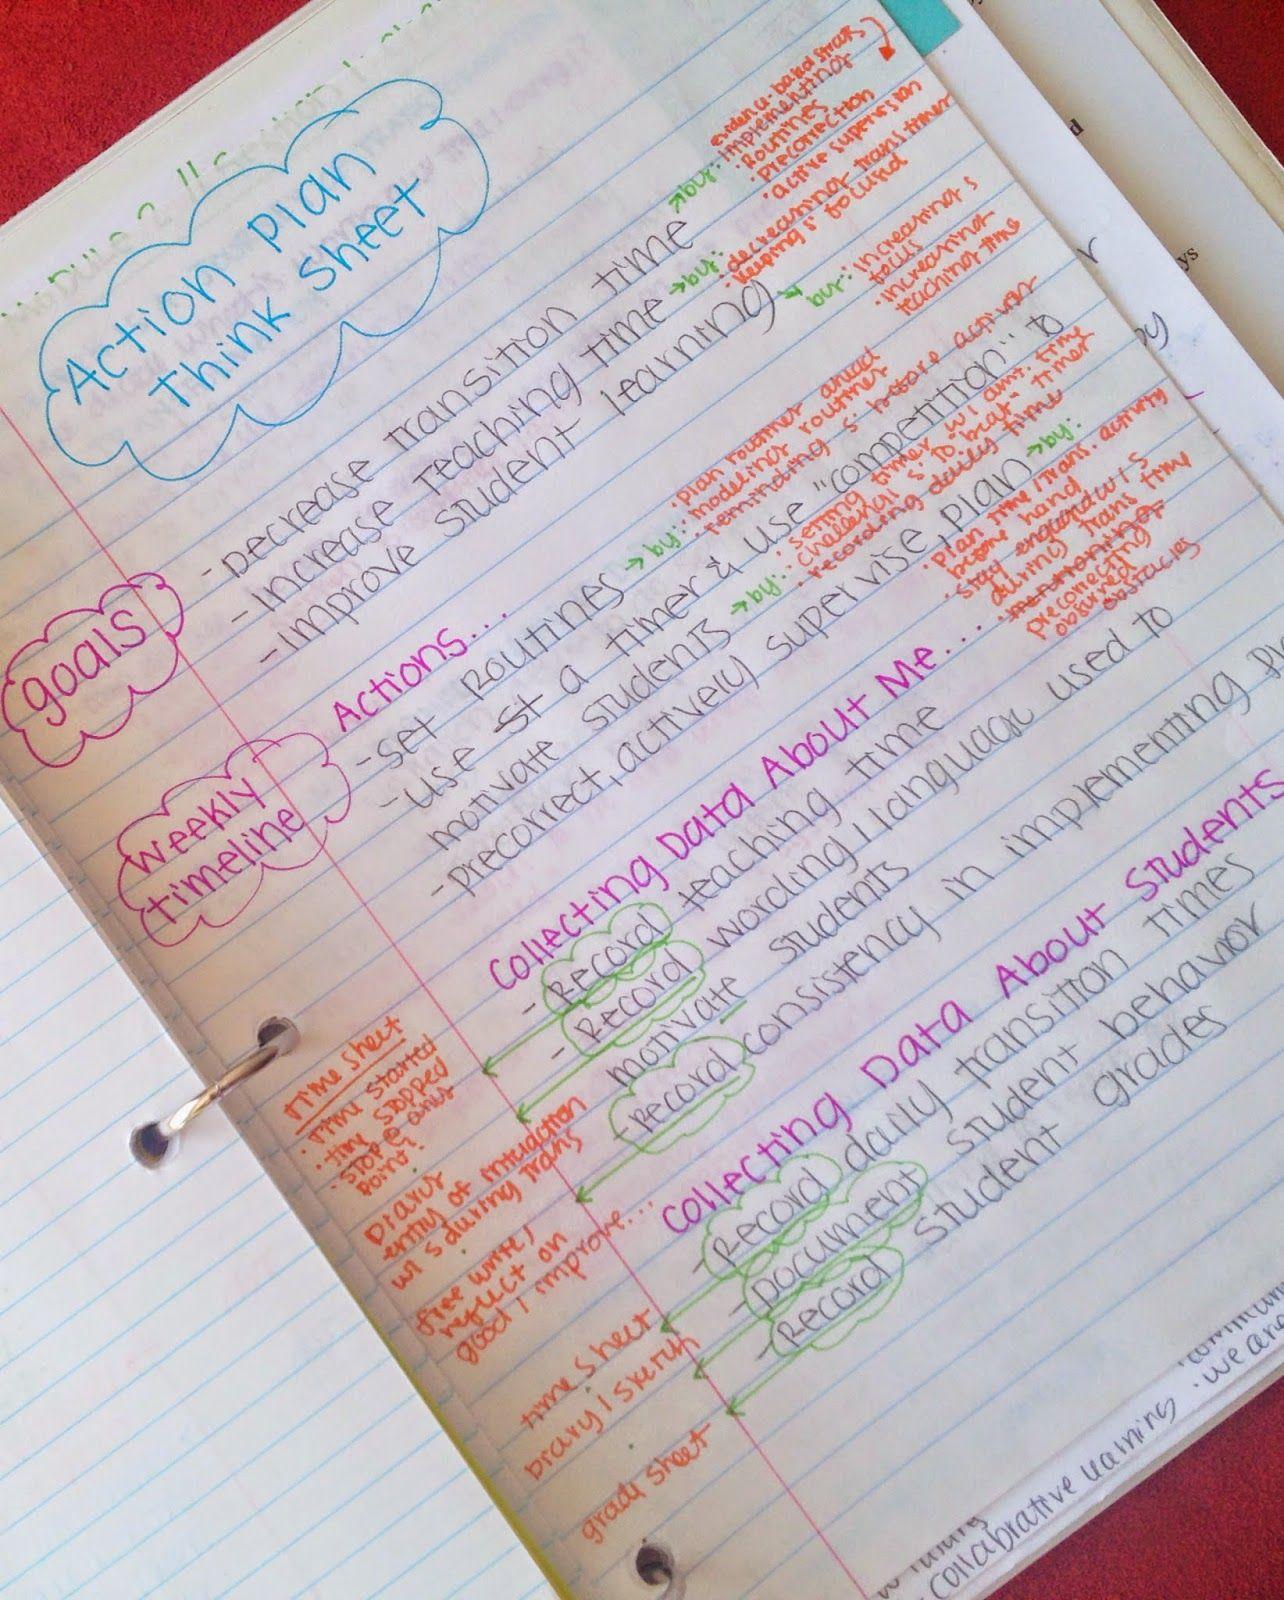 Grade 10 high school organisation, studying and notetaking?